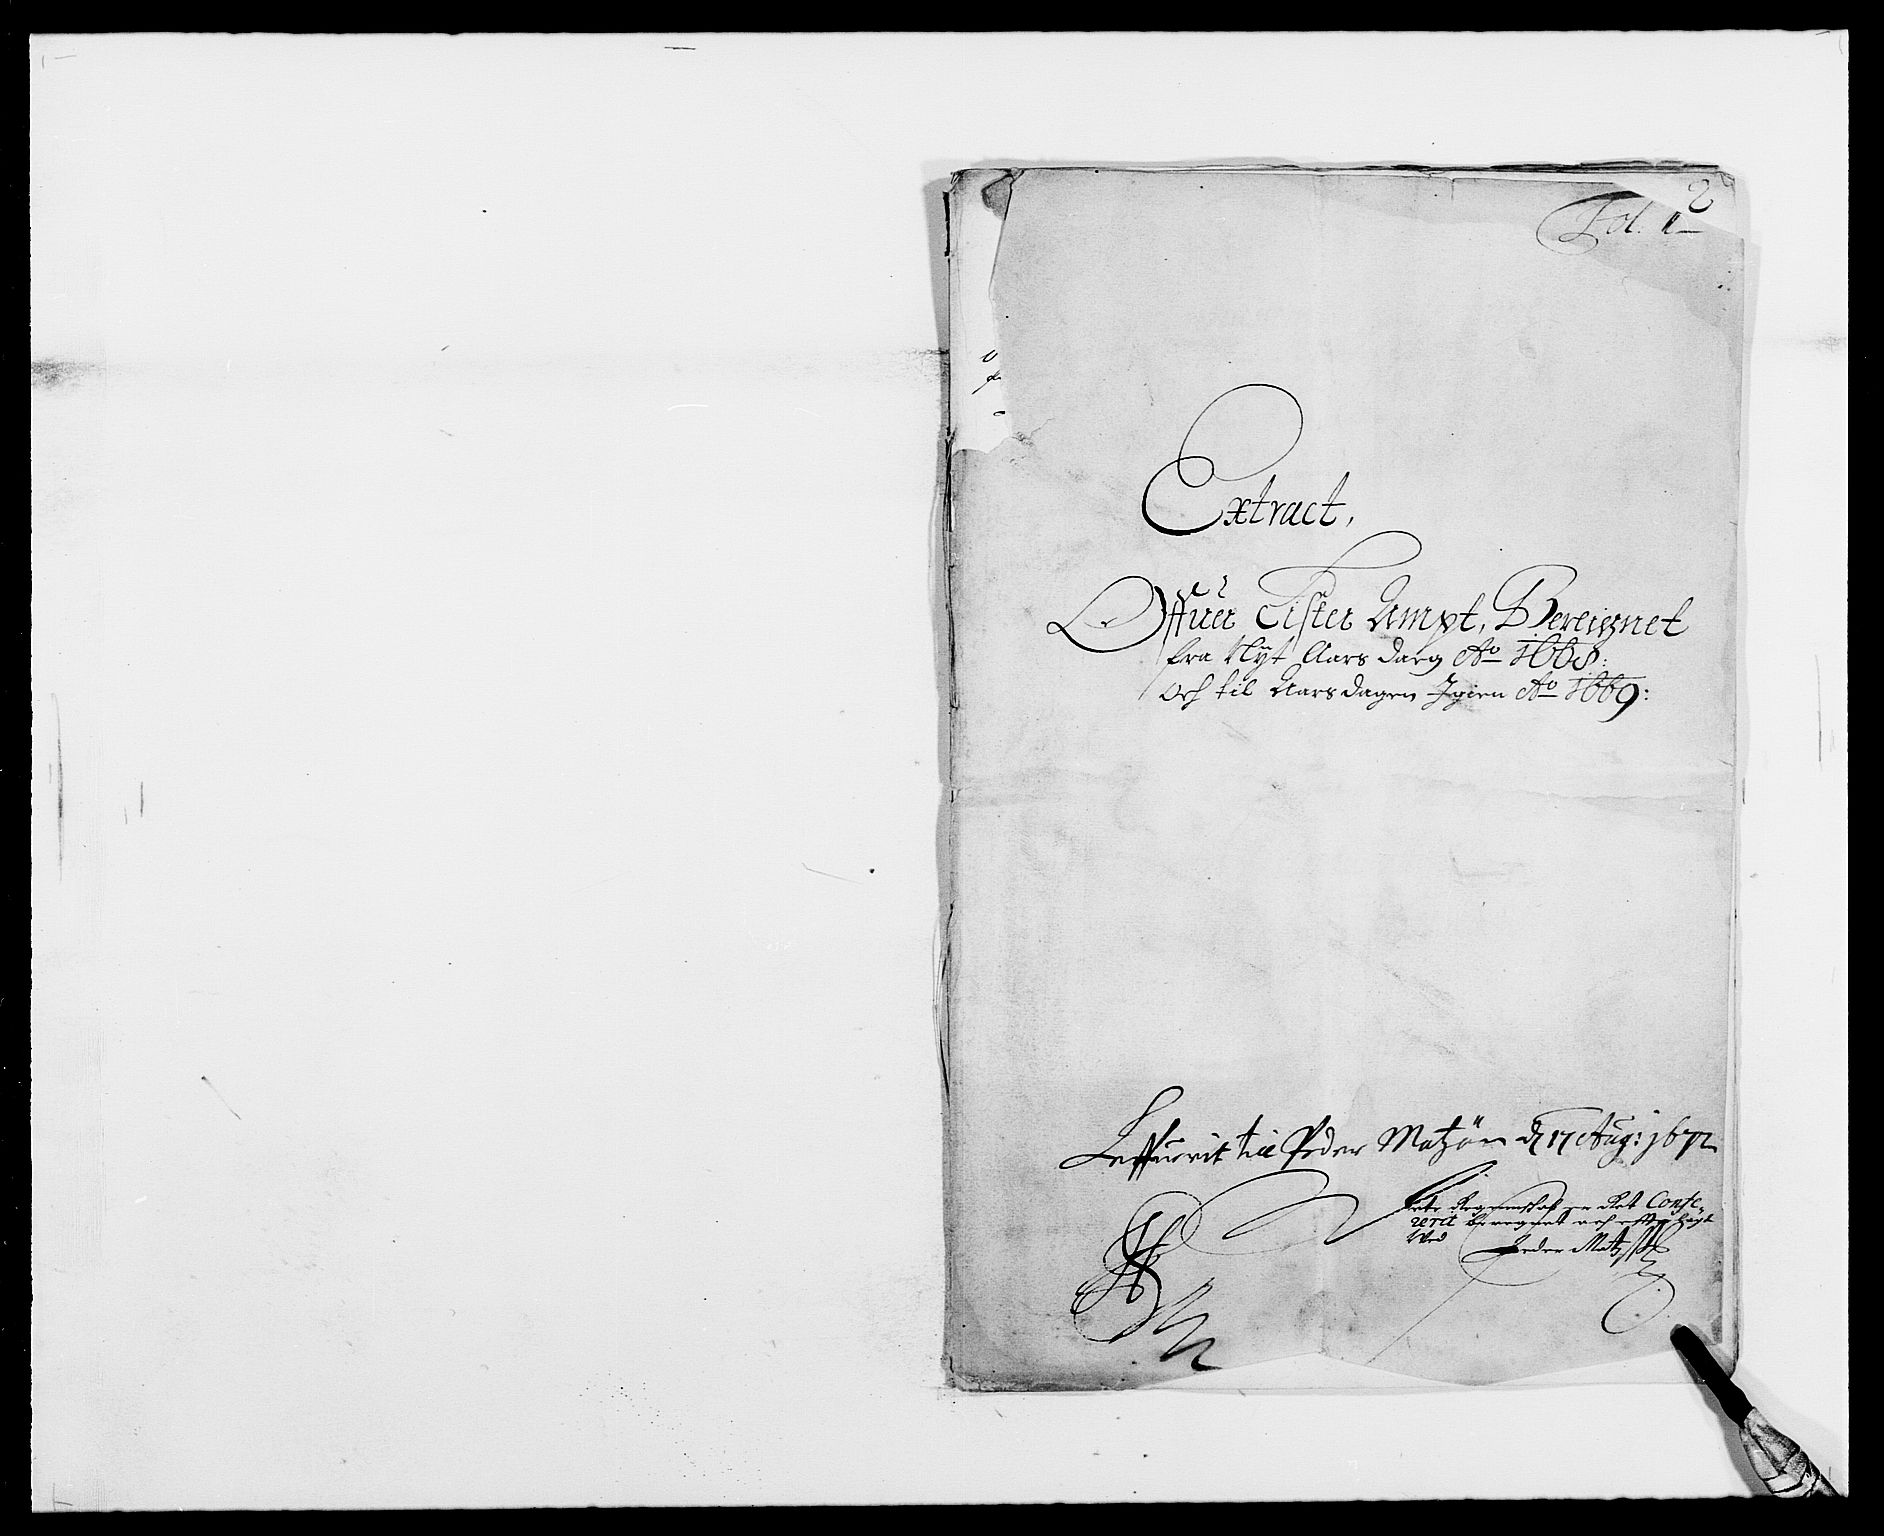 RA, Rentekammeret inntil 1814, Reviderte regnskaper, Fogderegnskap, R41/L2524: Fogderegnskap Lista, 1665-1668, s. 340